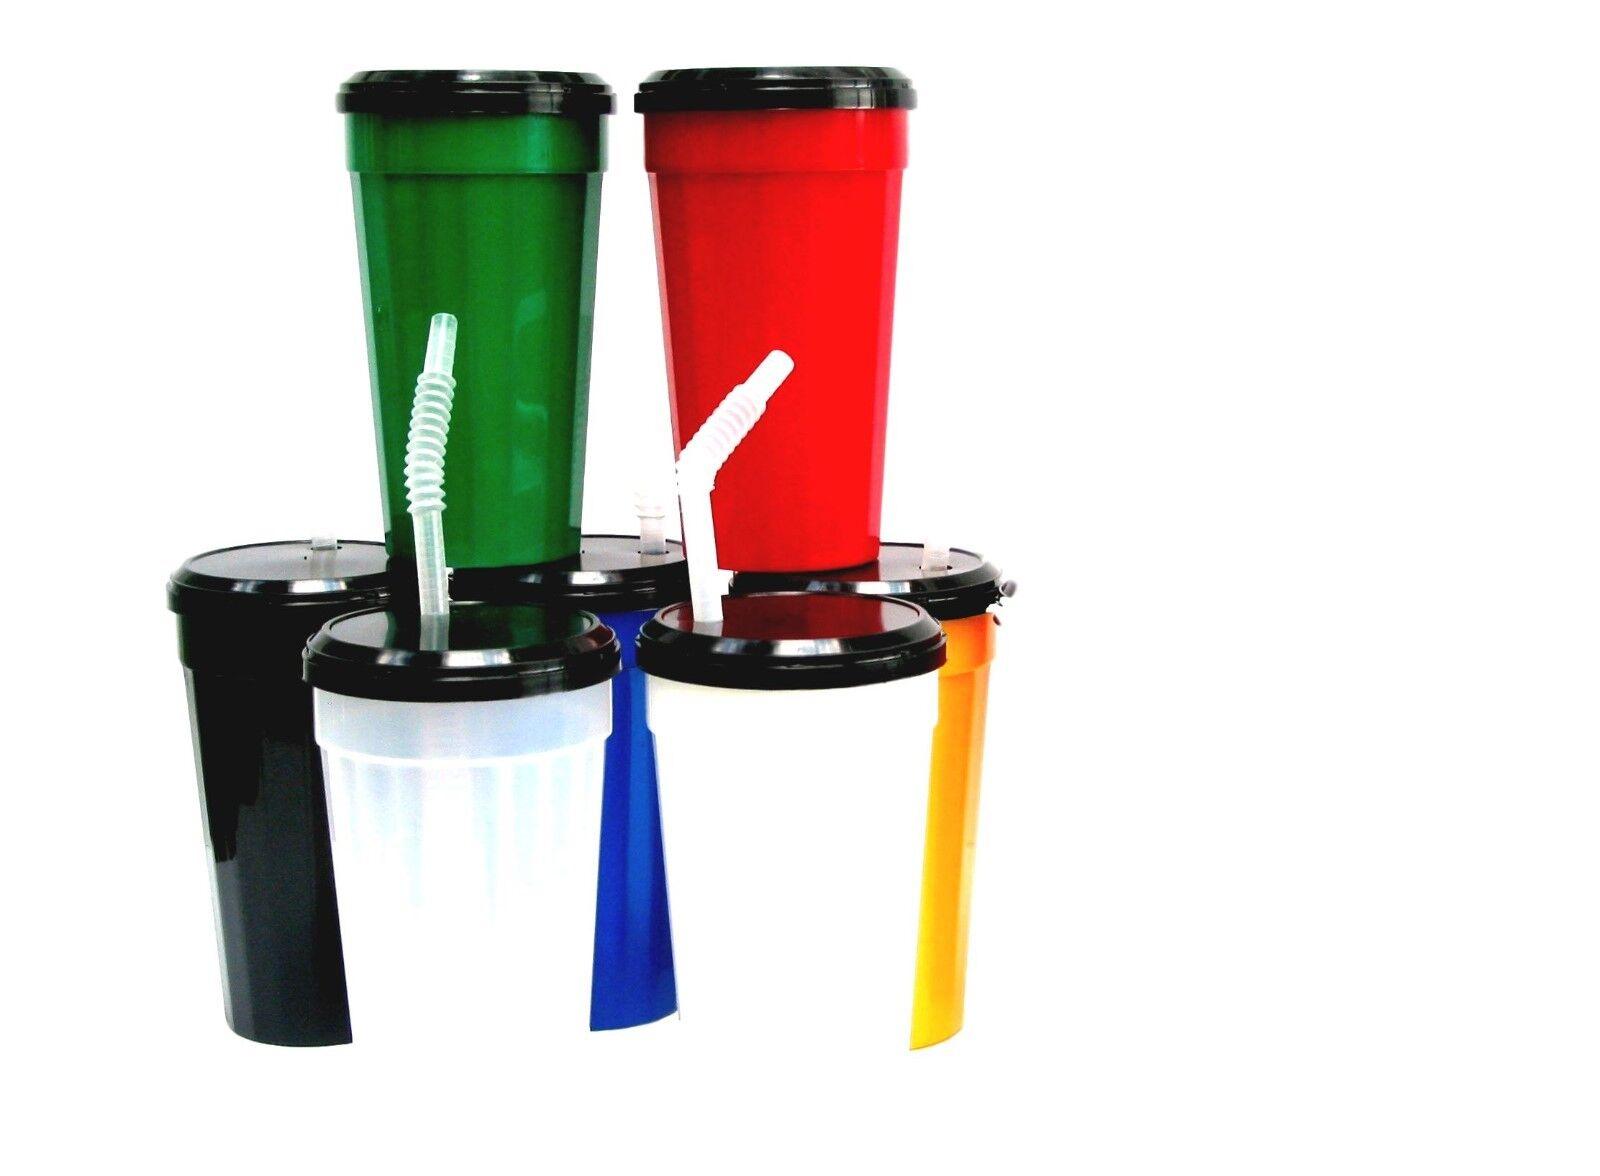 14 Lg Plastic Drinking Glasses Tumblers Lids Straws Mix of 7 Farbes Mfg in USA.